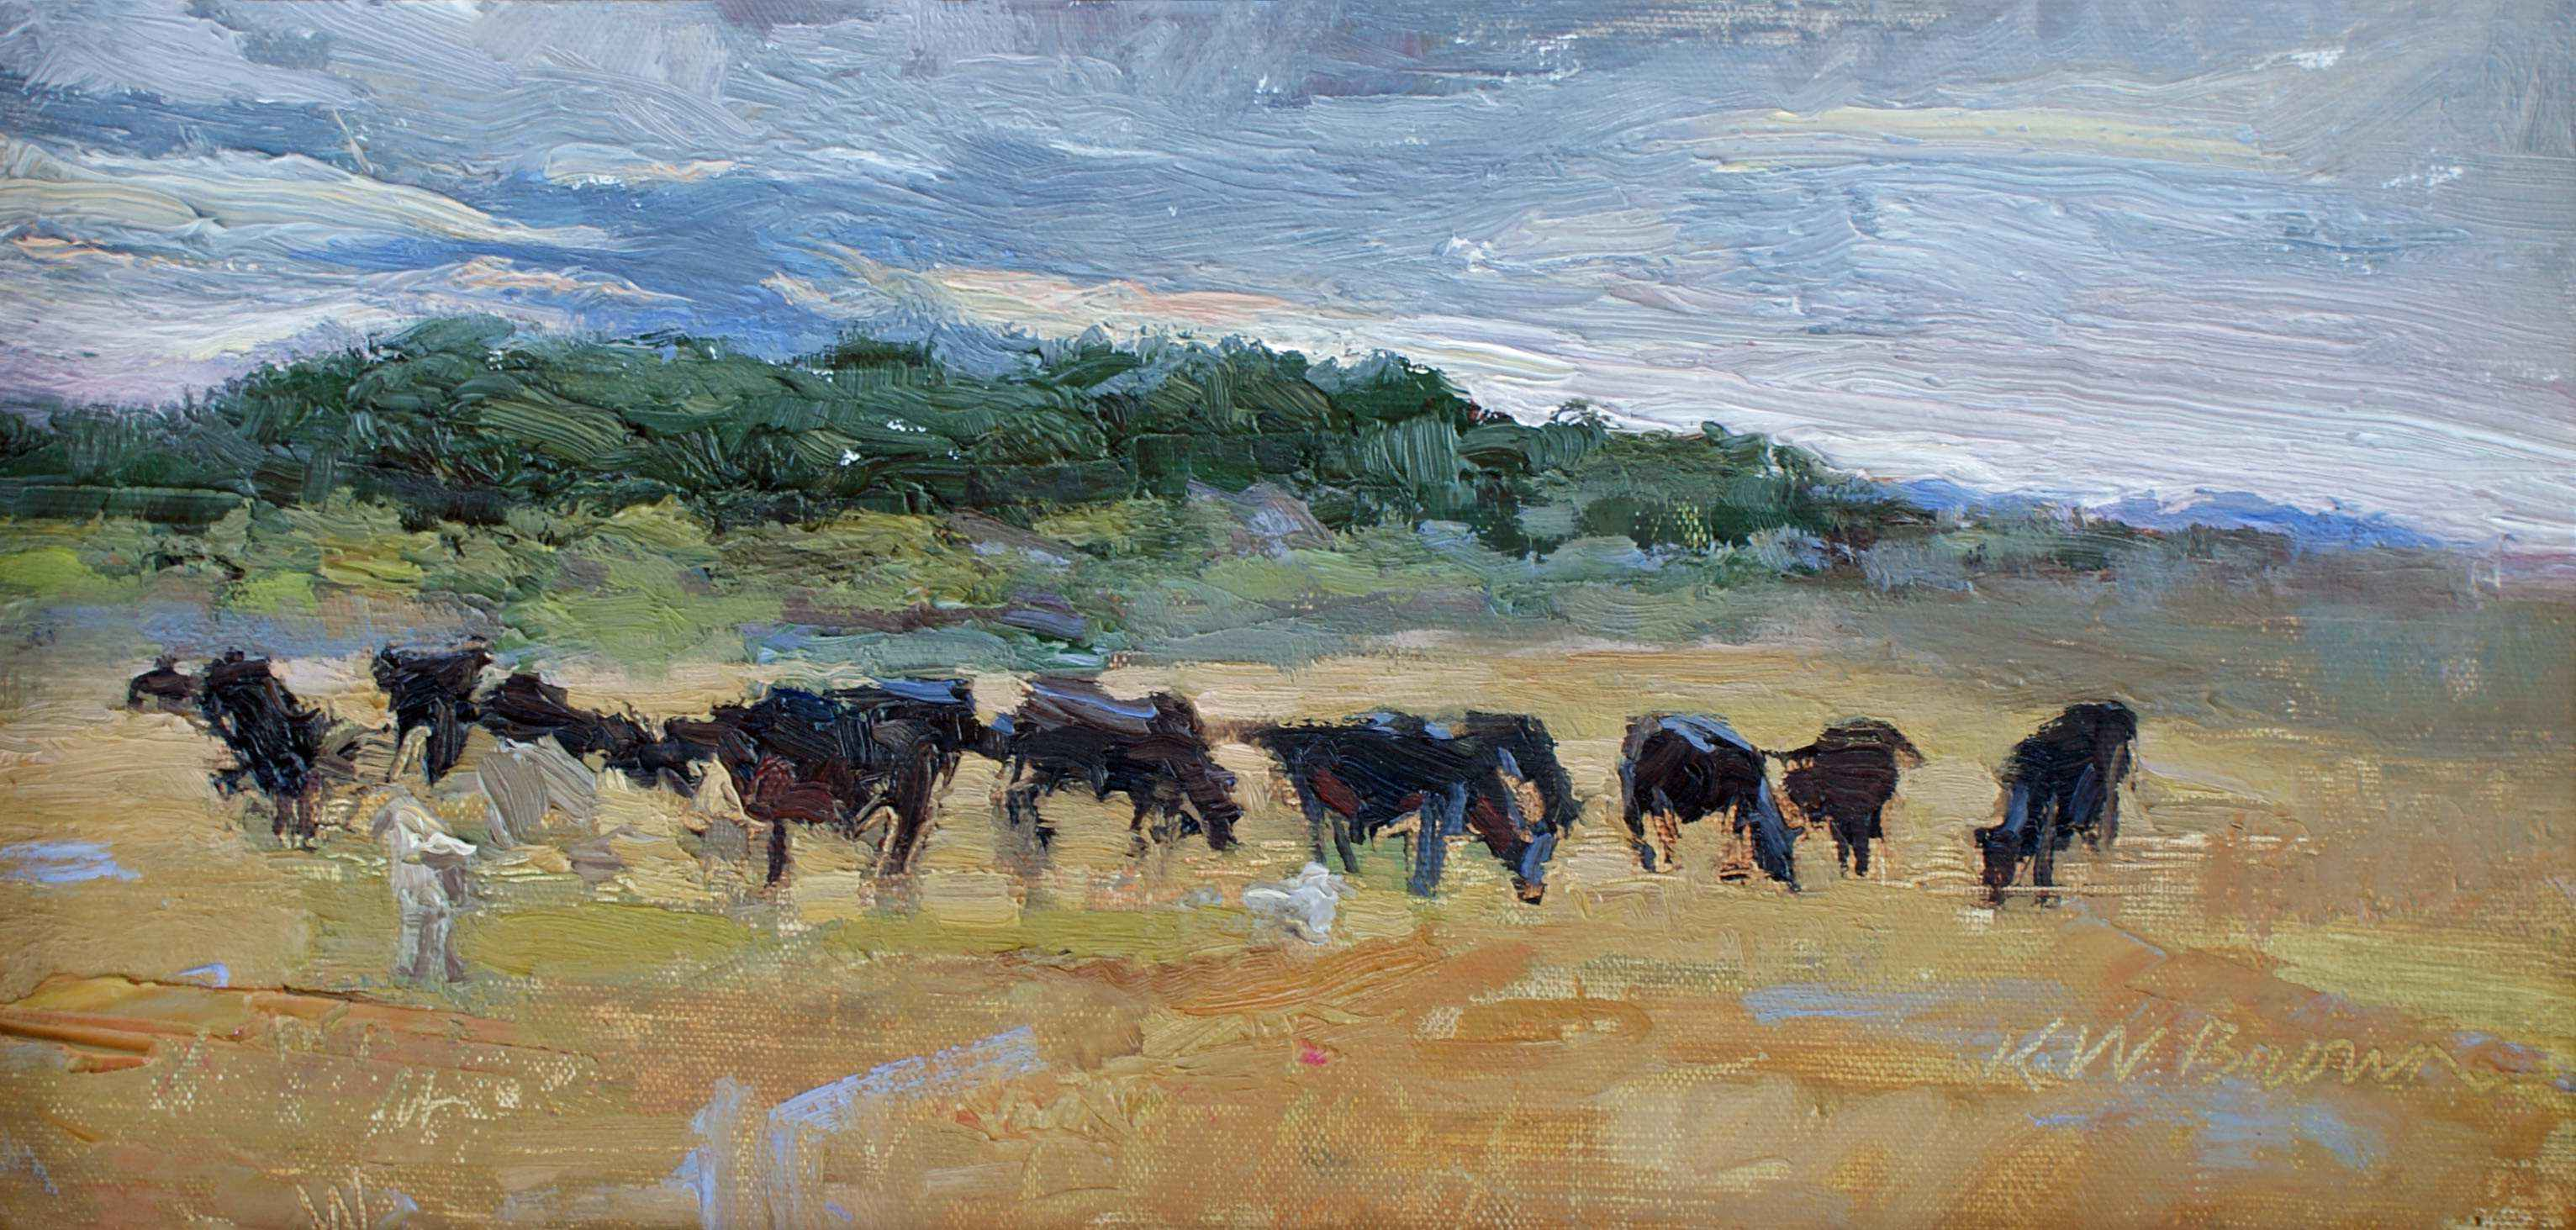 Cow Staging by  Krystal Brown - Masterpiece Online